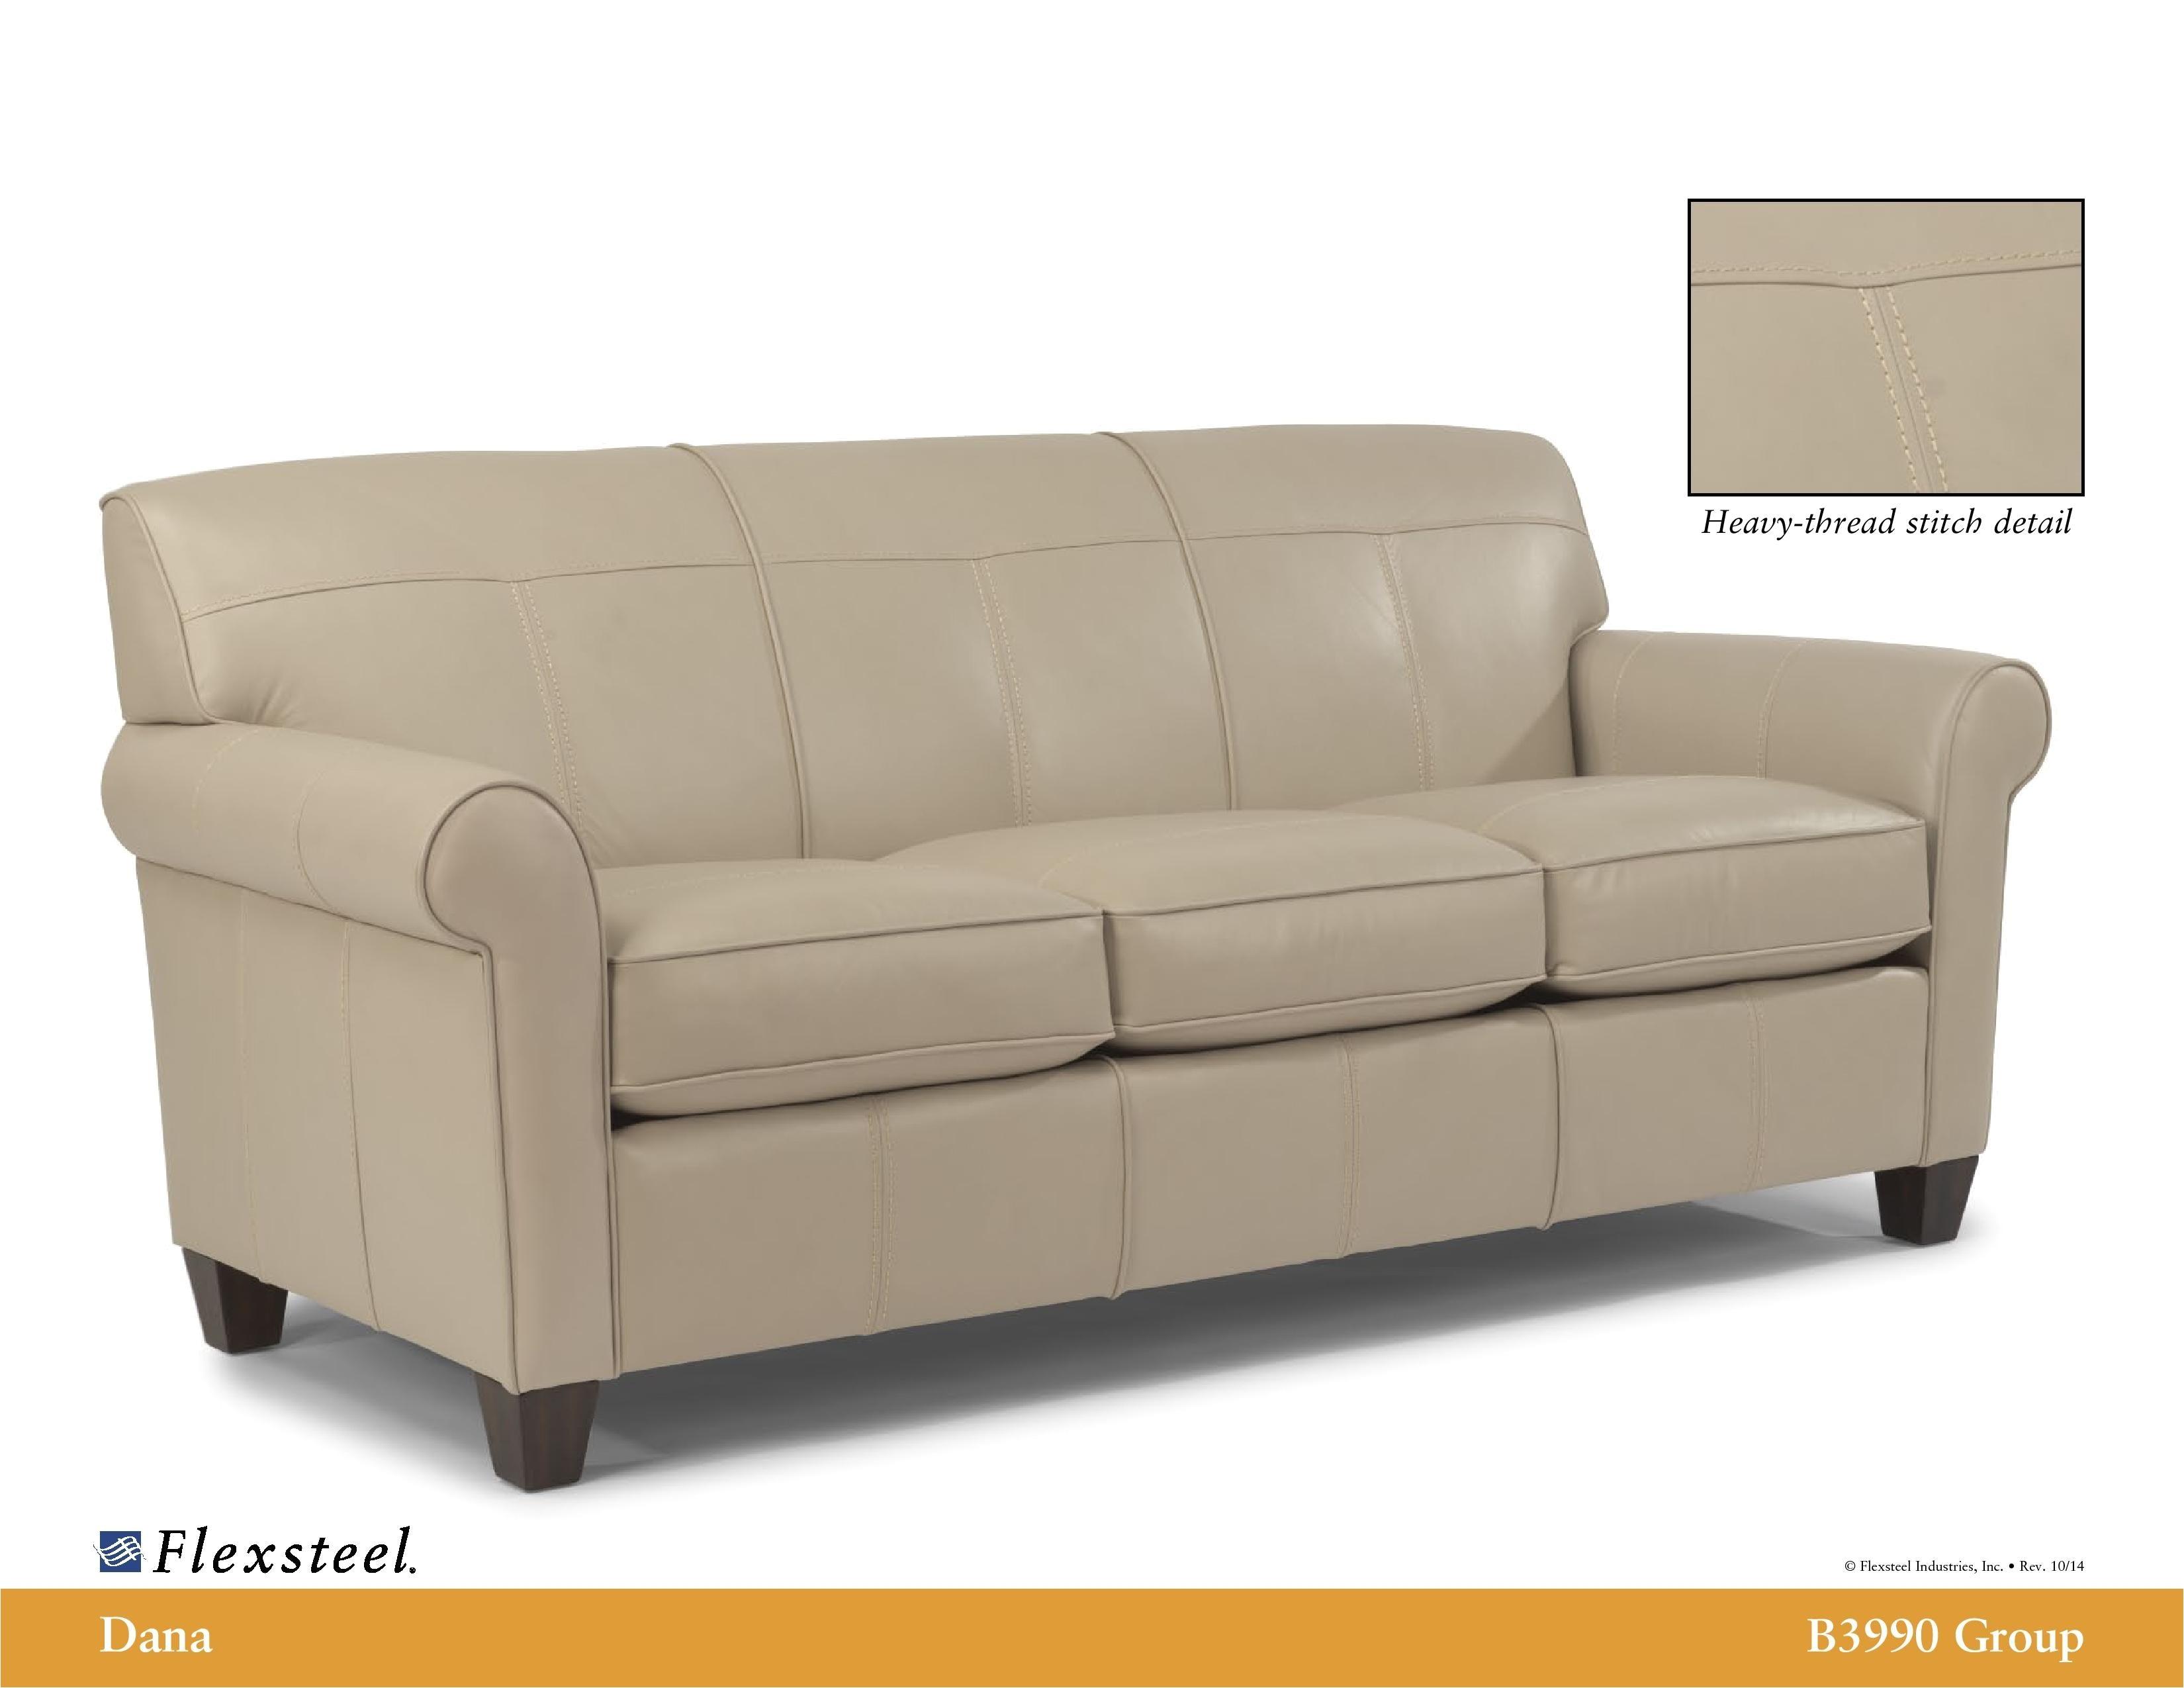 Flexsteel sofa Sleeper Flexsteel sofa Bed Air Mattress Pinterest